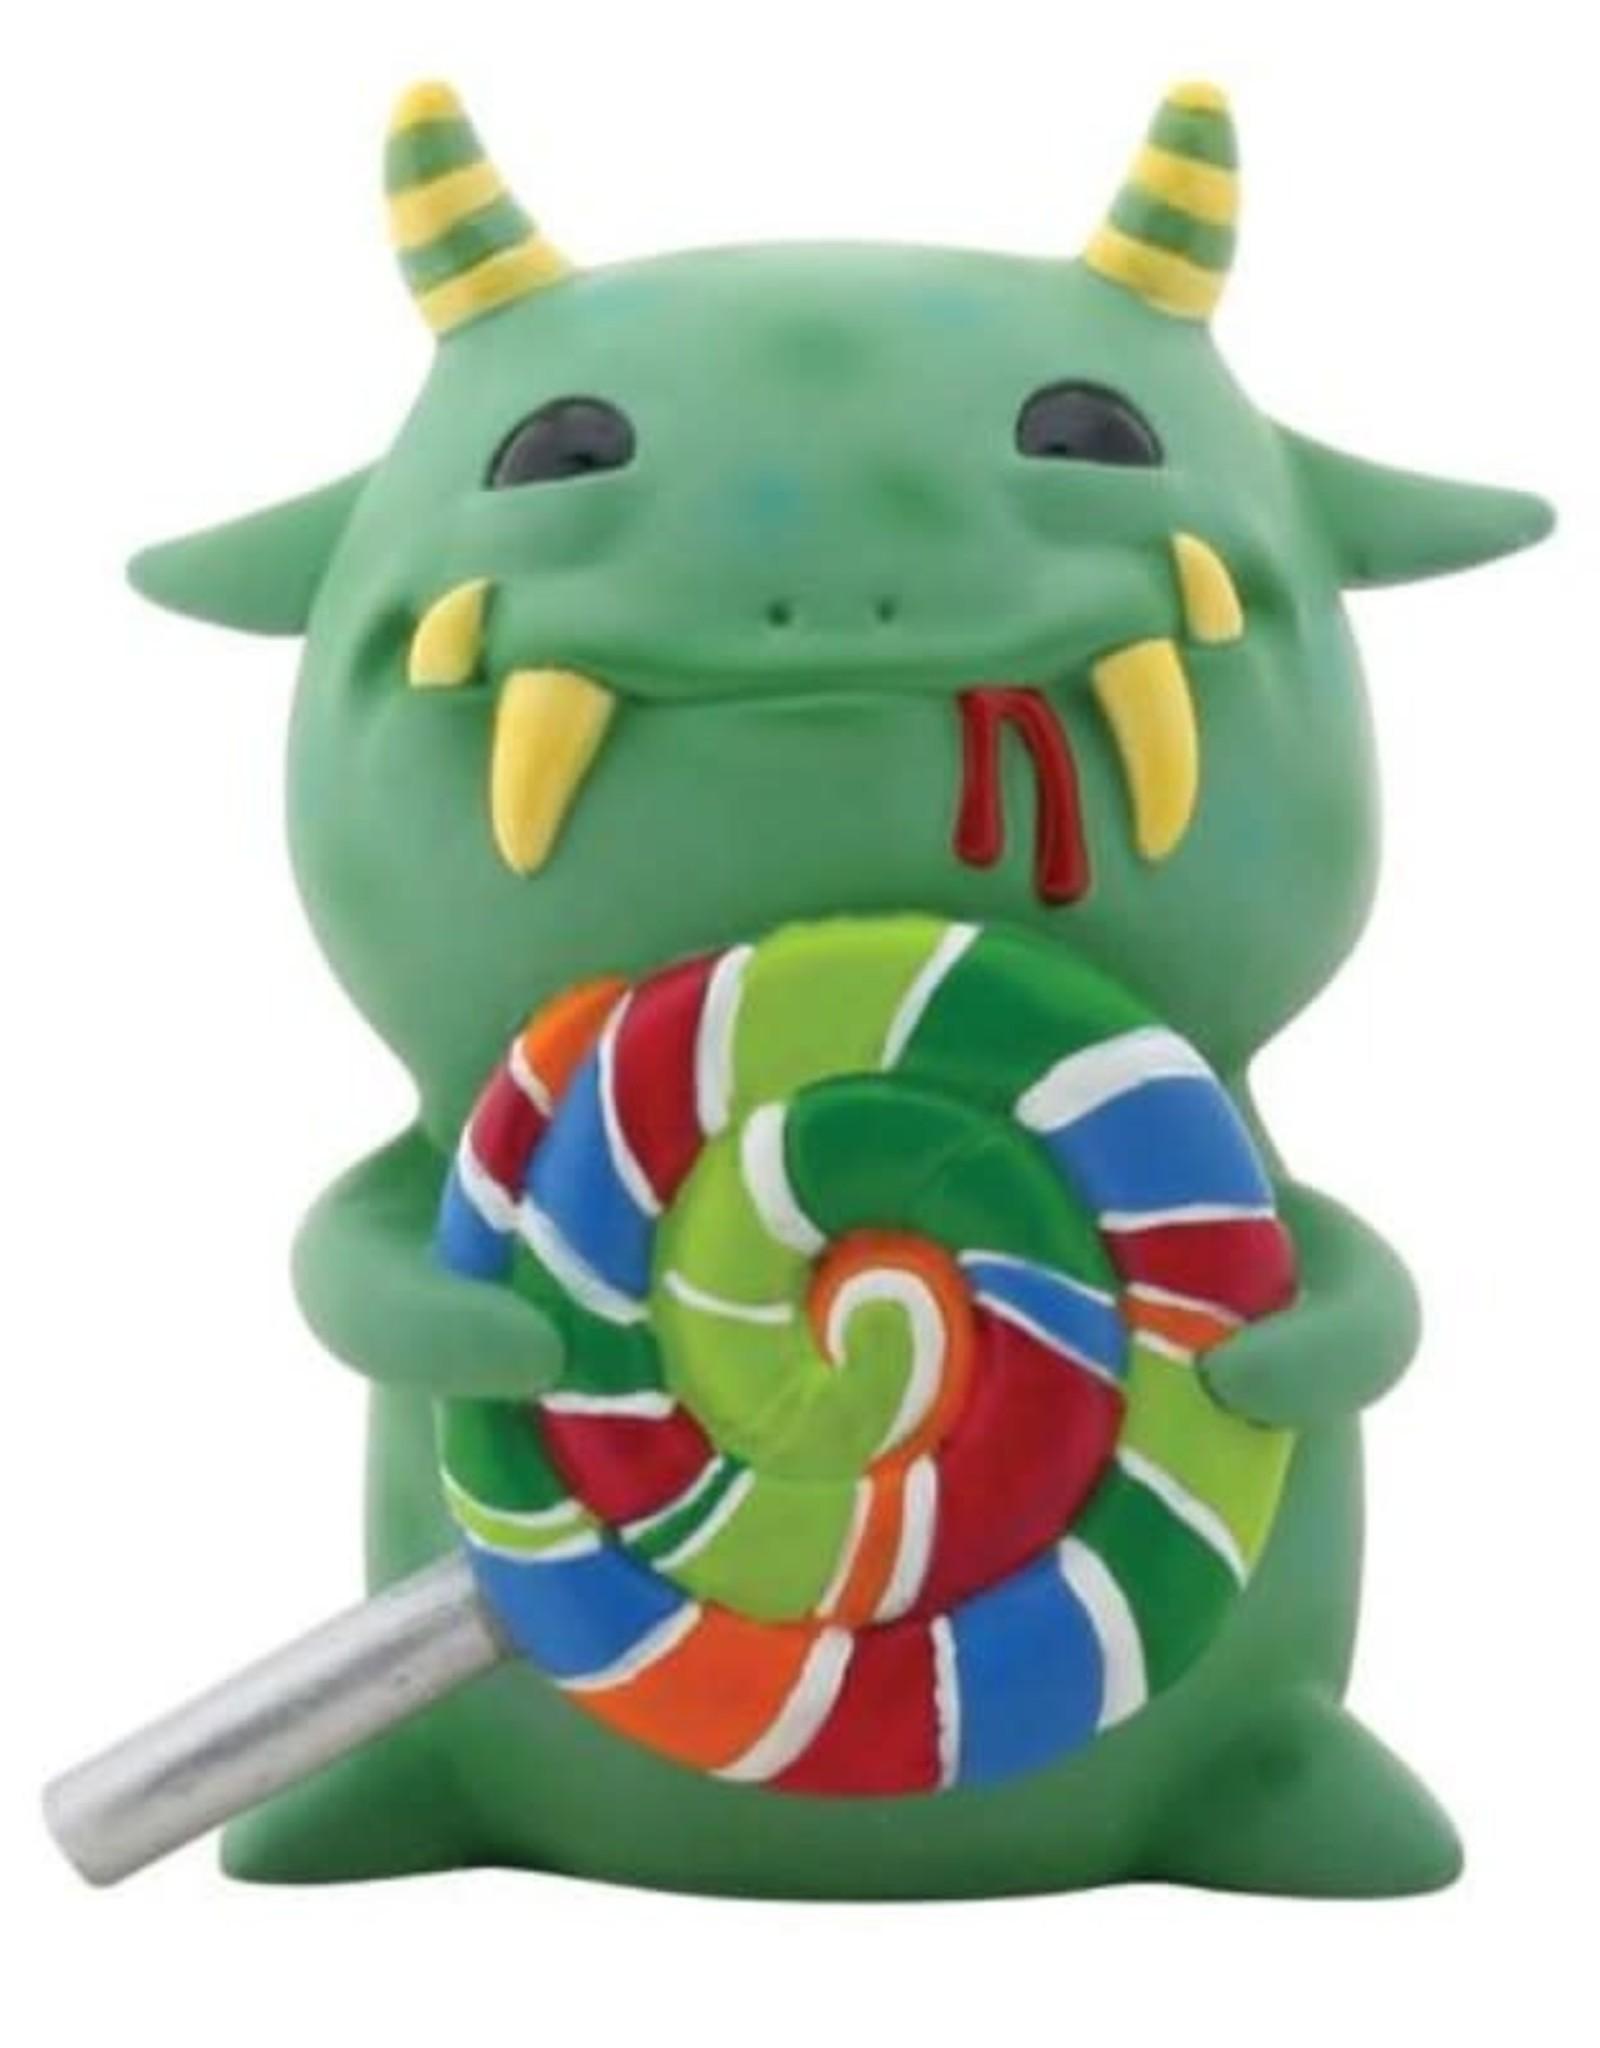 Underbedz Mogu Mogu with Lollipop